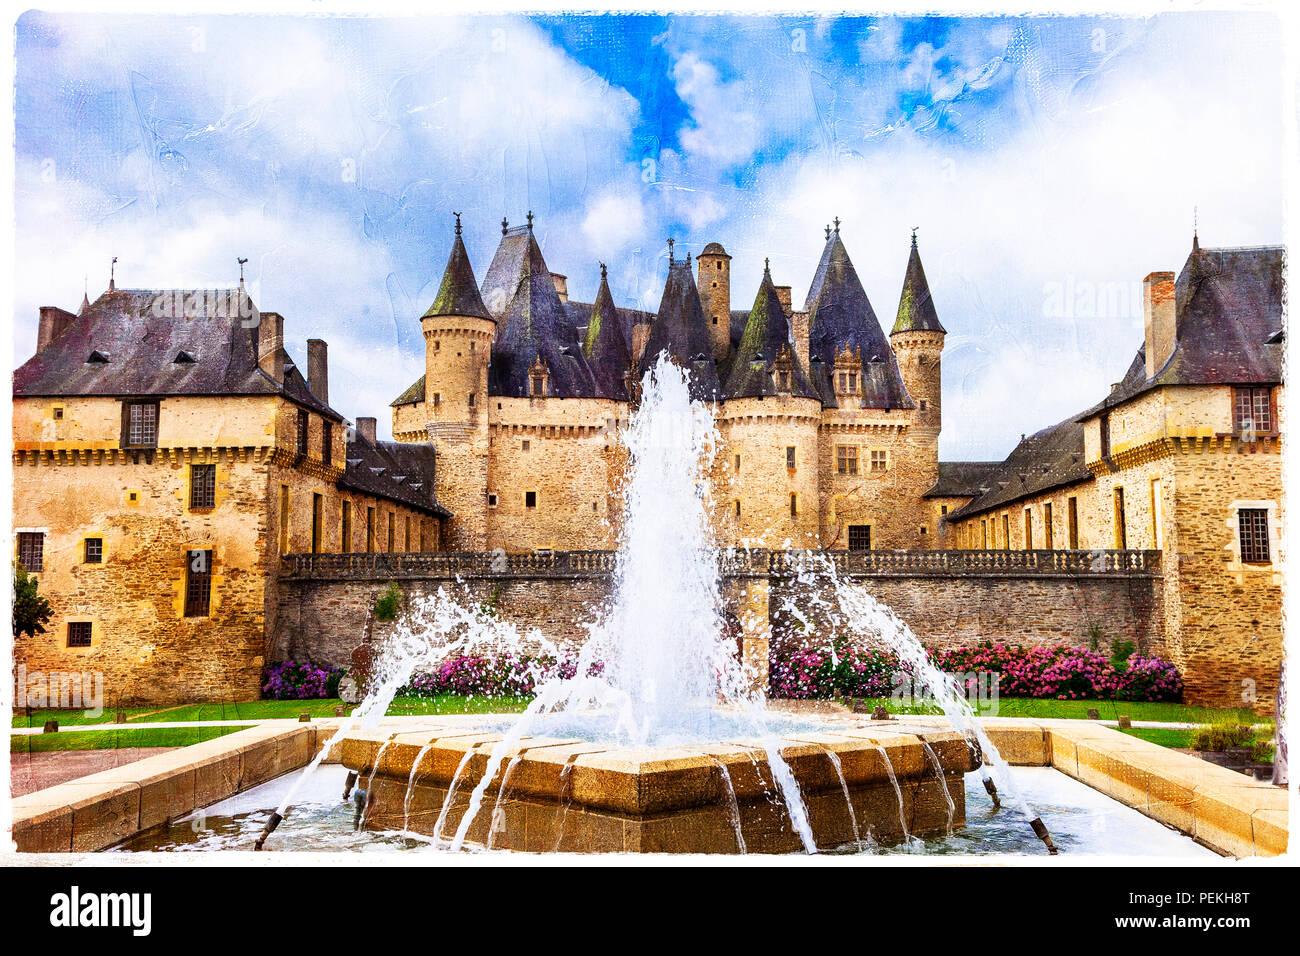 Elegant Jumilhac le grand,medieval castle,France. - Stock Image